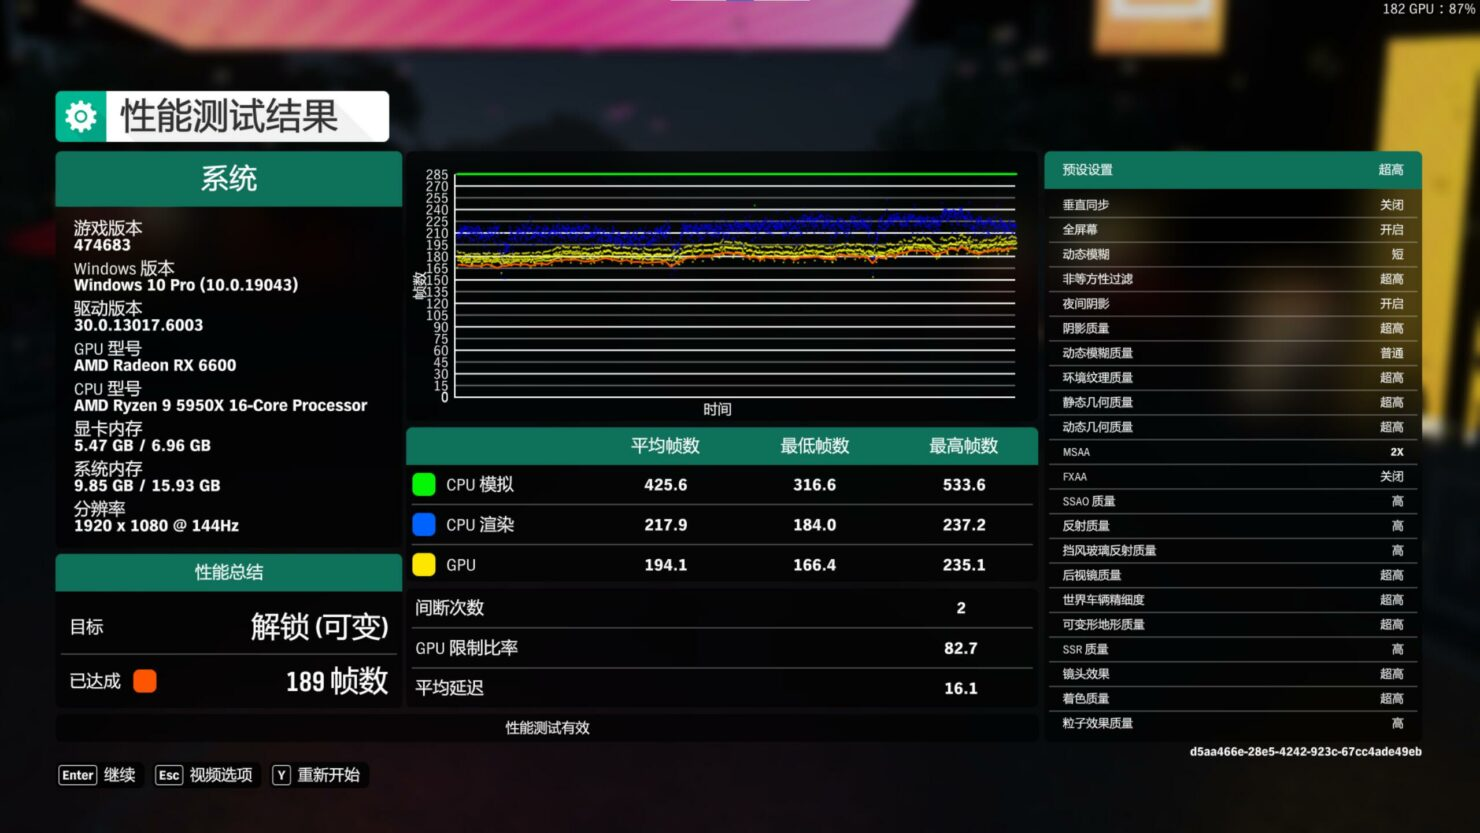 intel-core-i9-12900k-alder-lake-cpu-benchmarks-_-forza-horizon-4-vs-ryzen-9-5950x